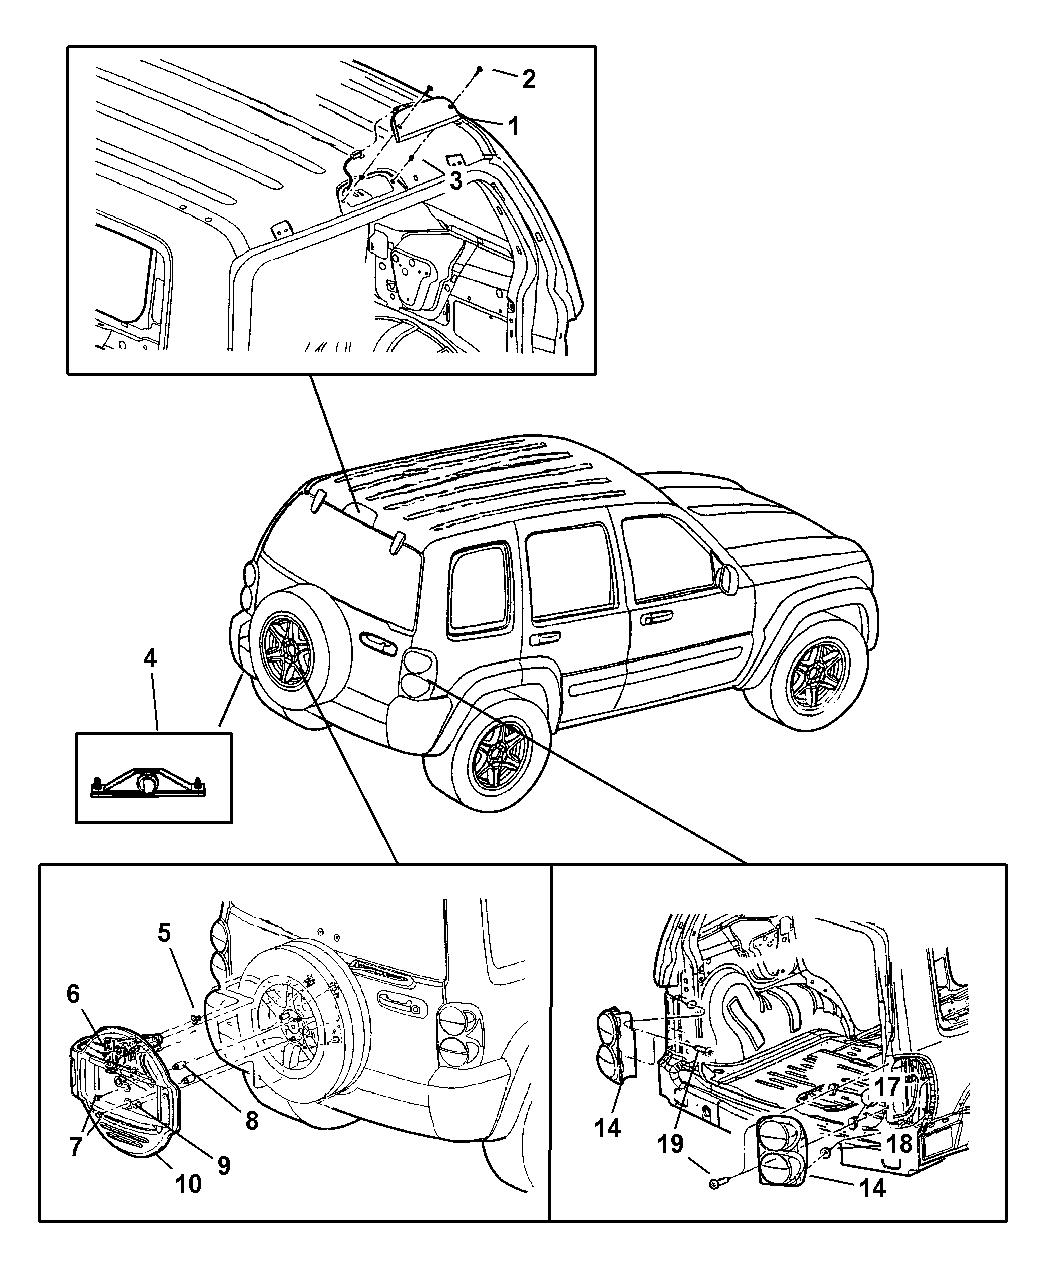 56010086ag